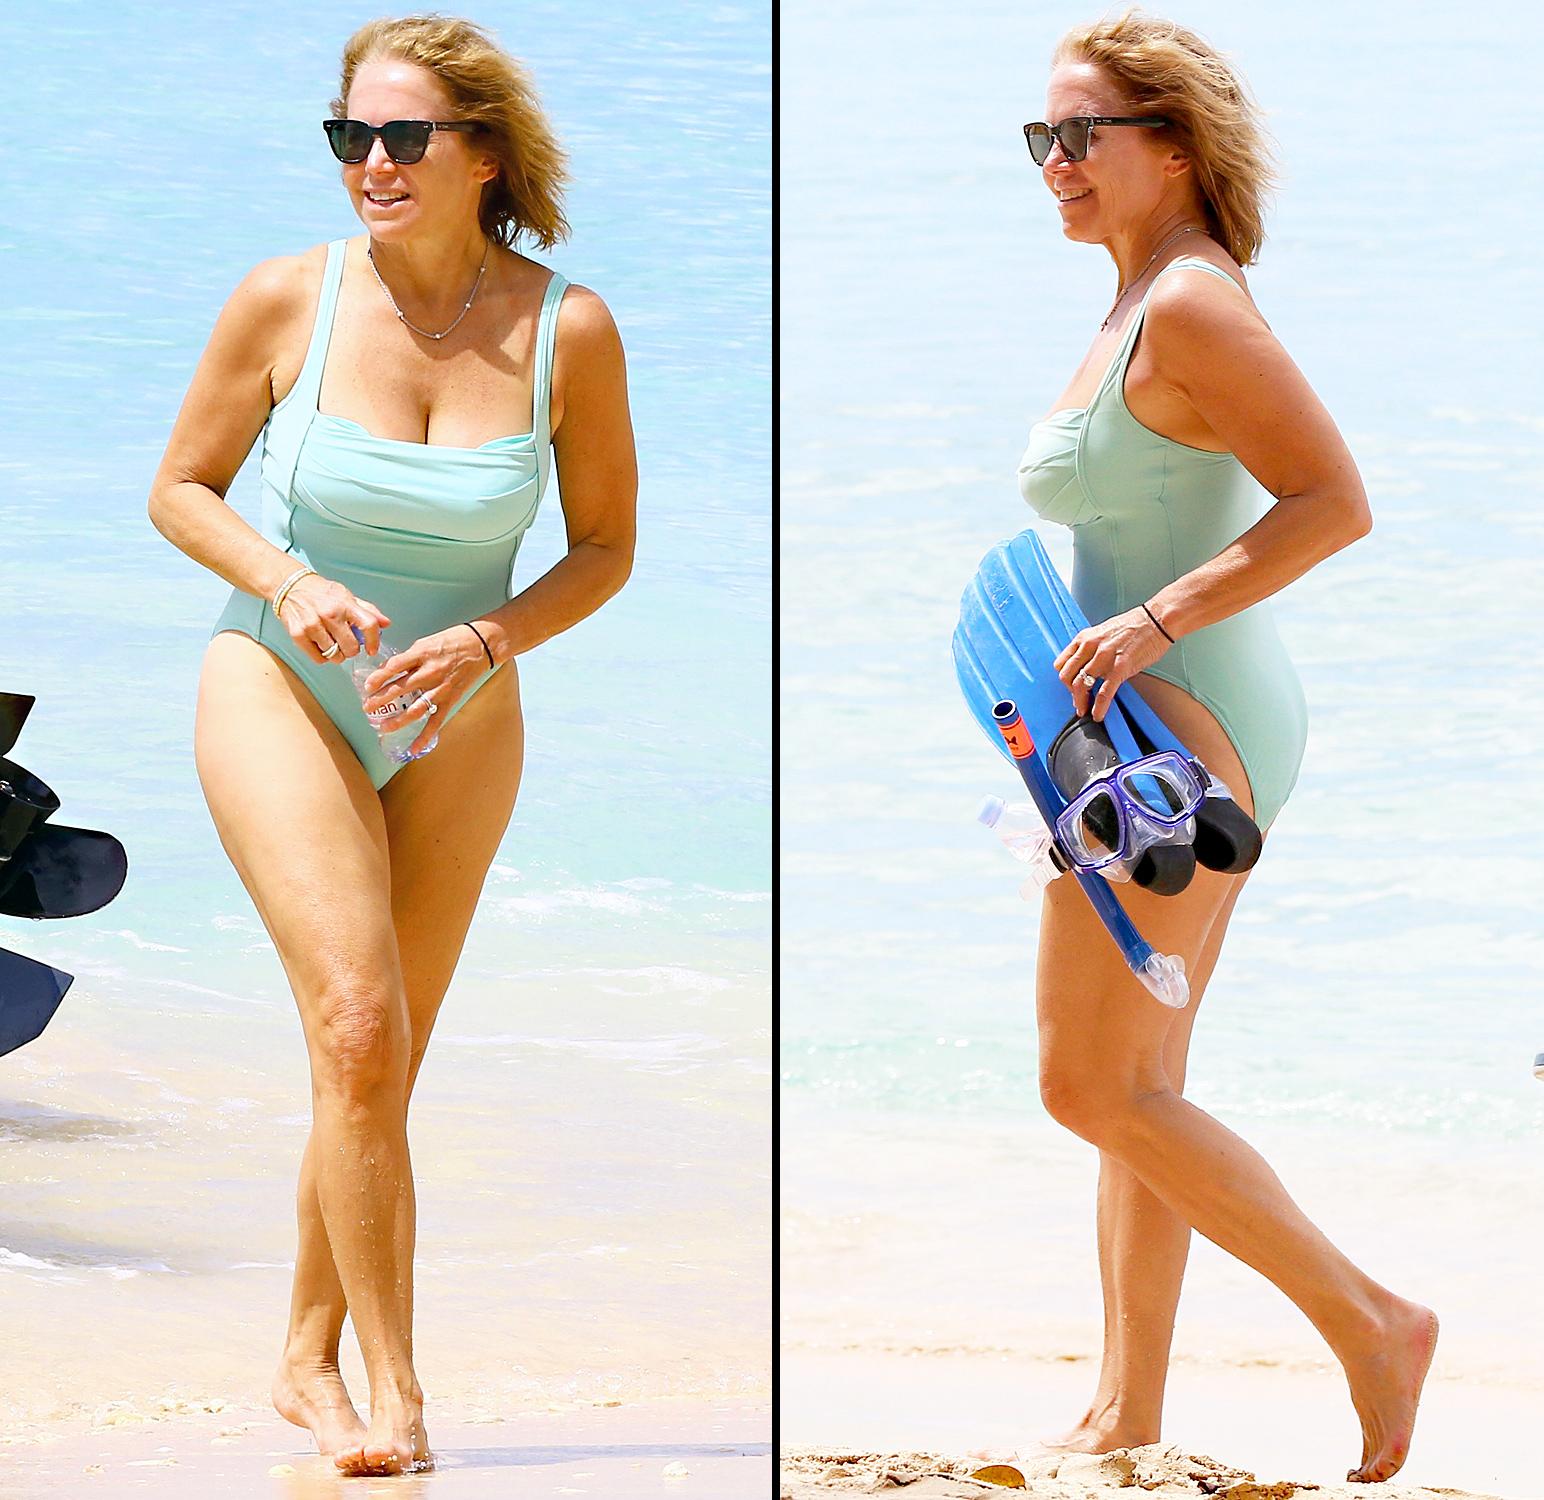 Katie kouric in bikini